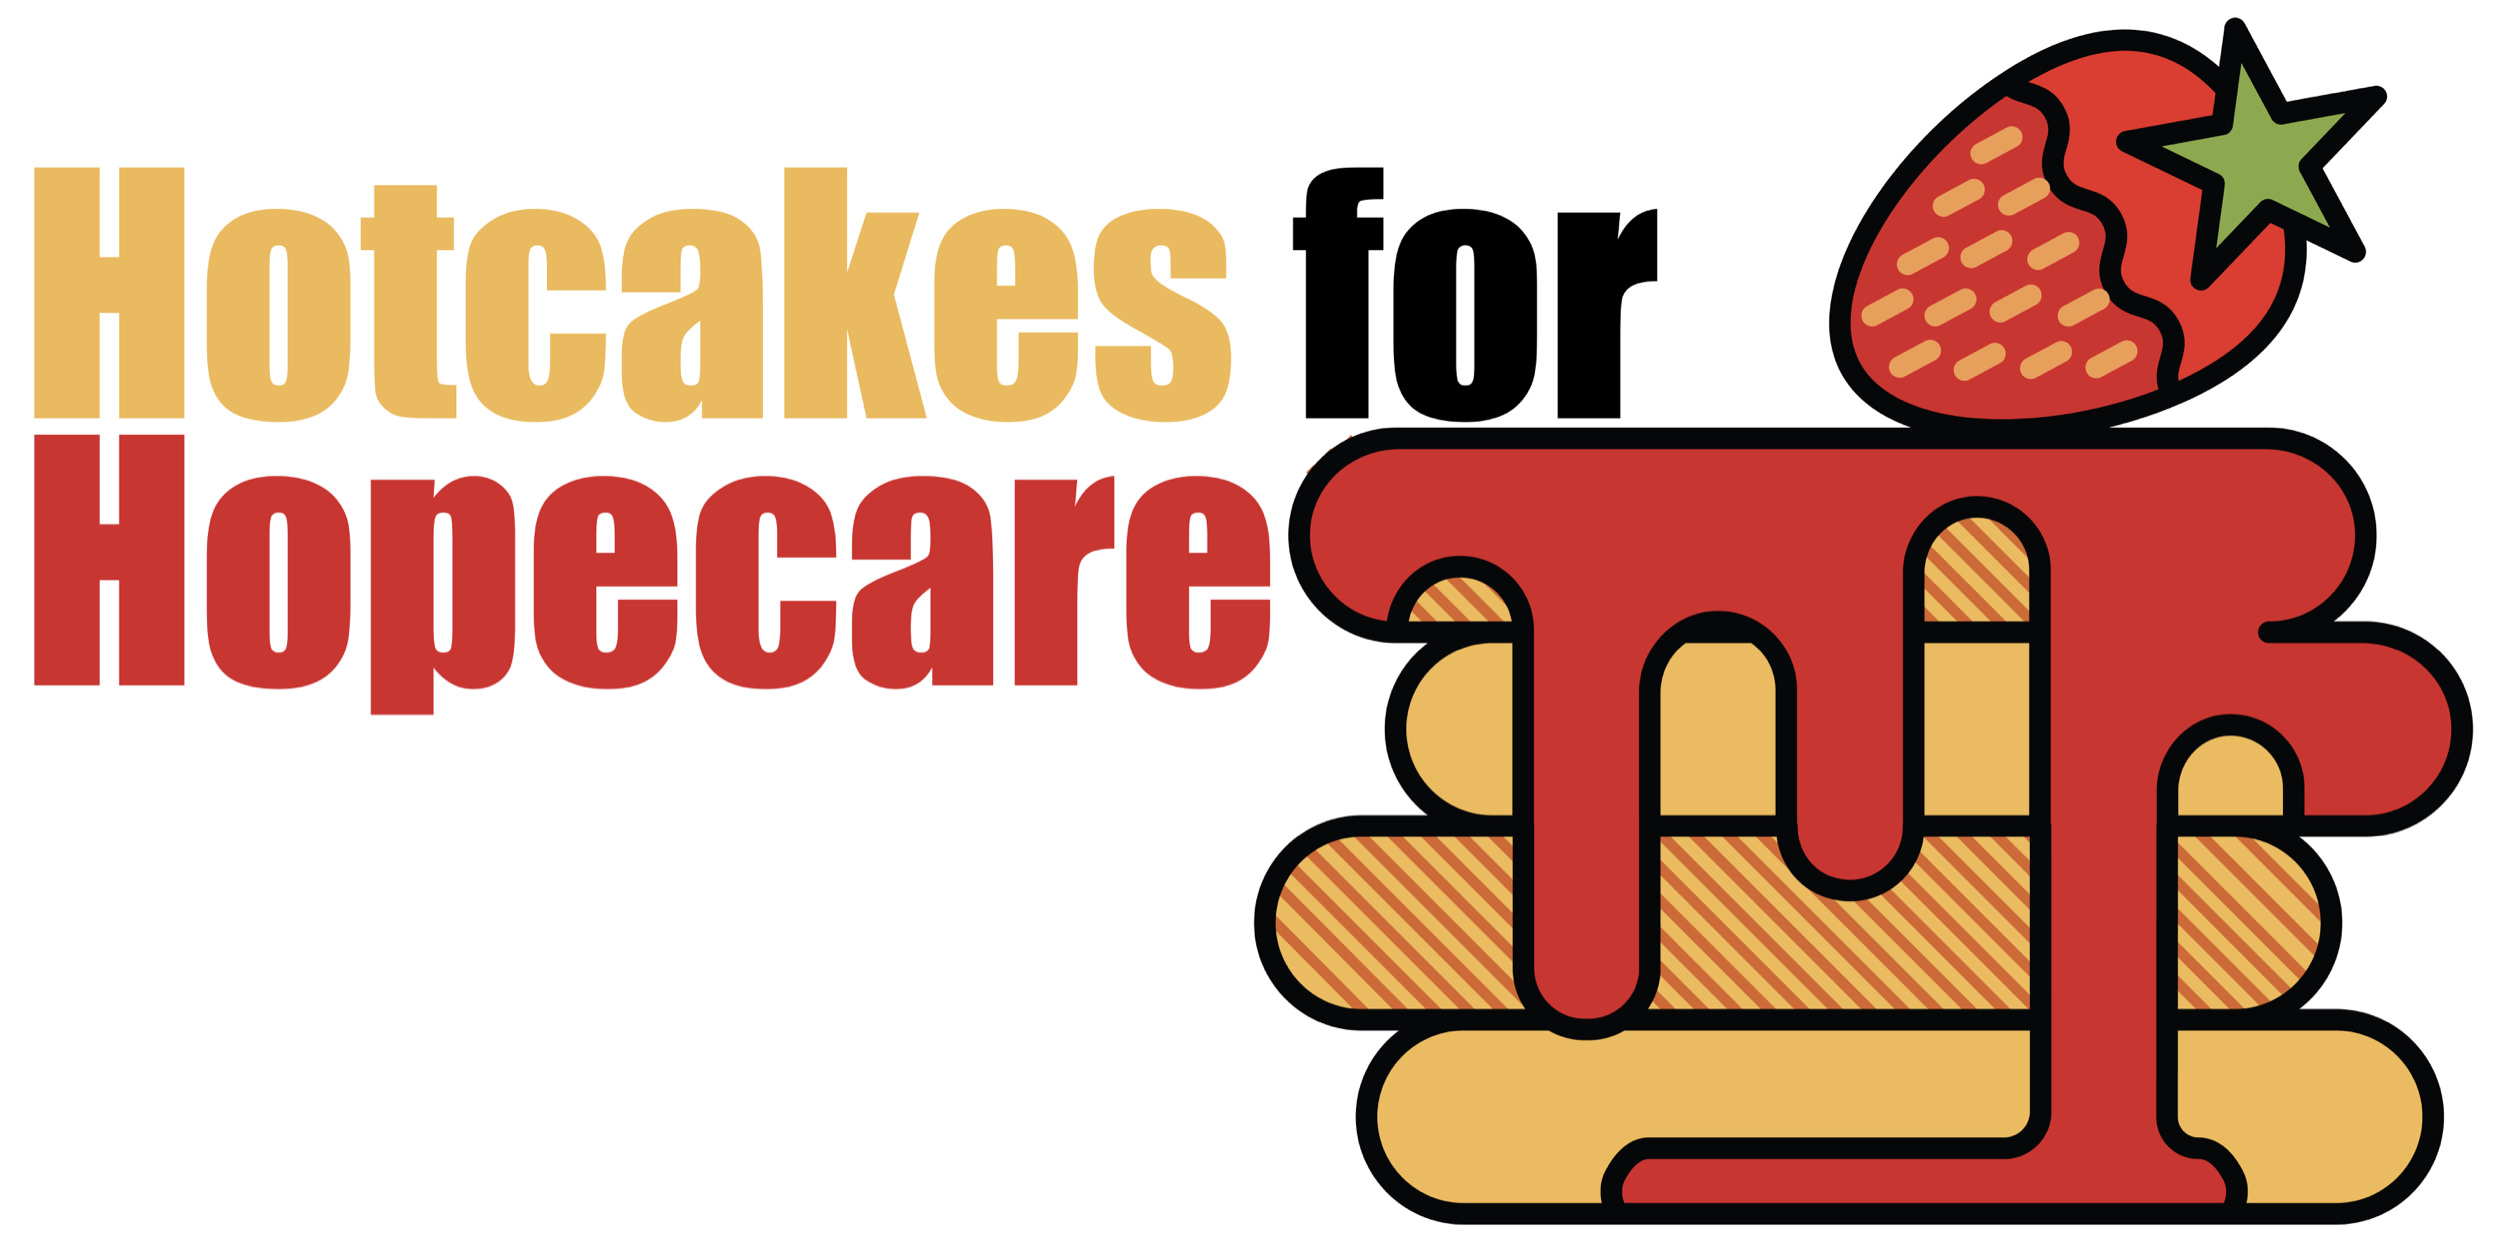 Hotcakes for Hopecare logo